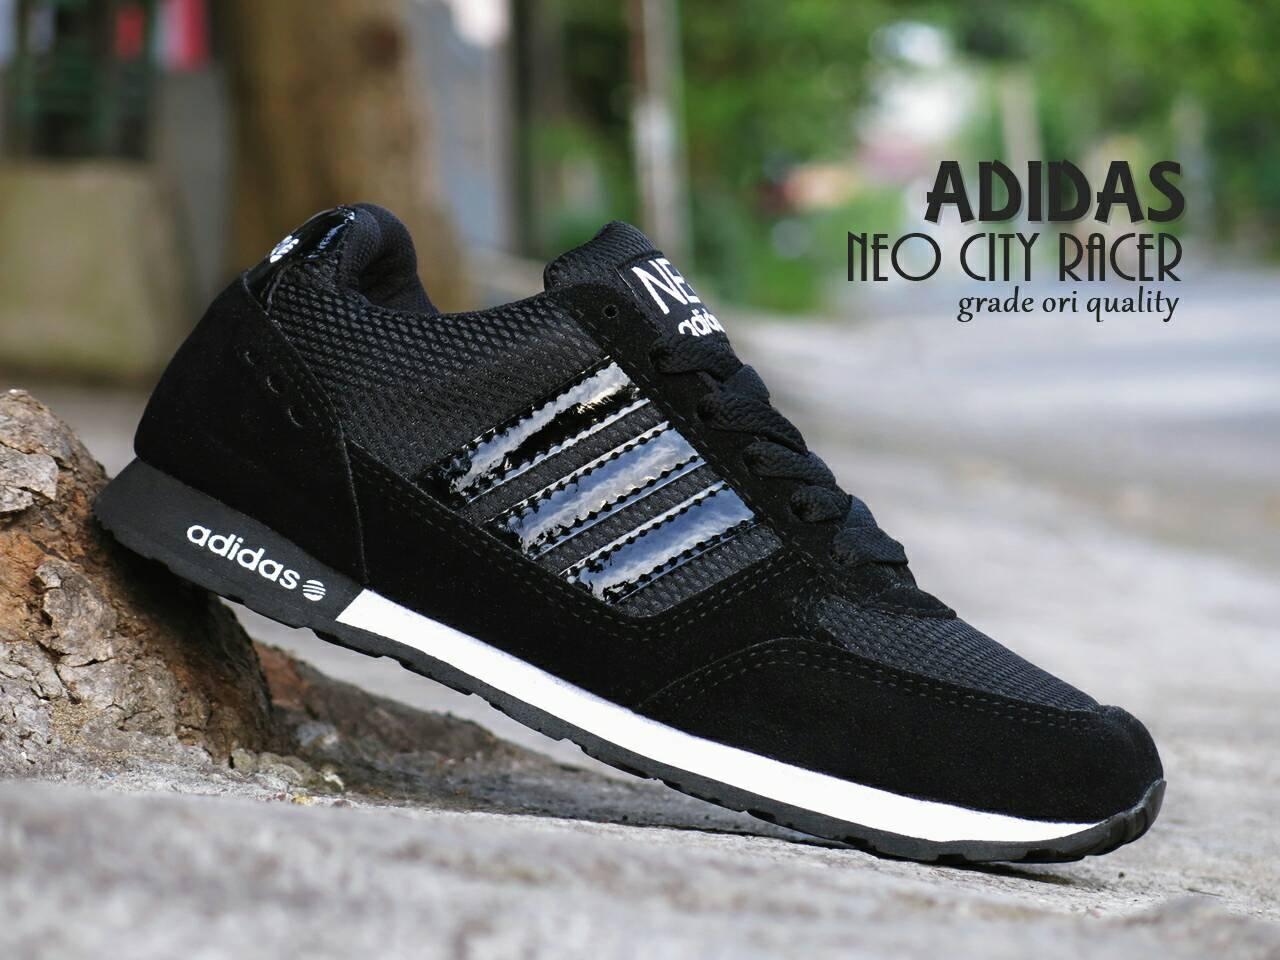 ... ireland jual sepatu sport adidas neo city racer grade ori full black  hitam lapak sepatu sby 222a11d425